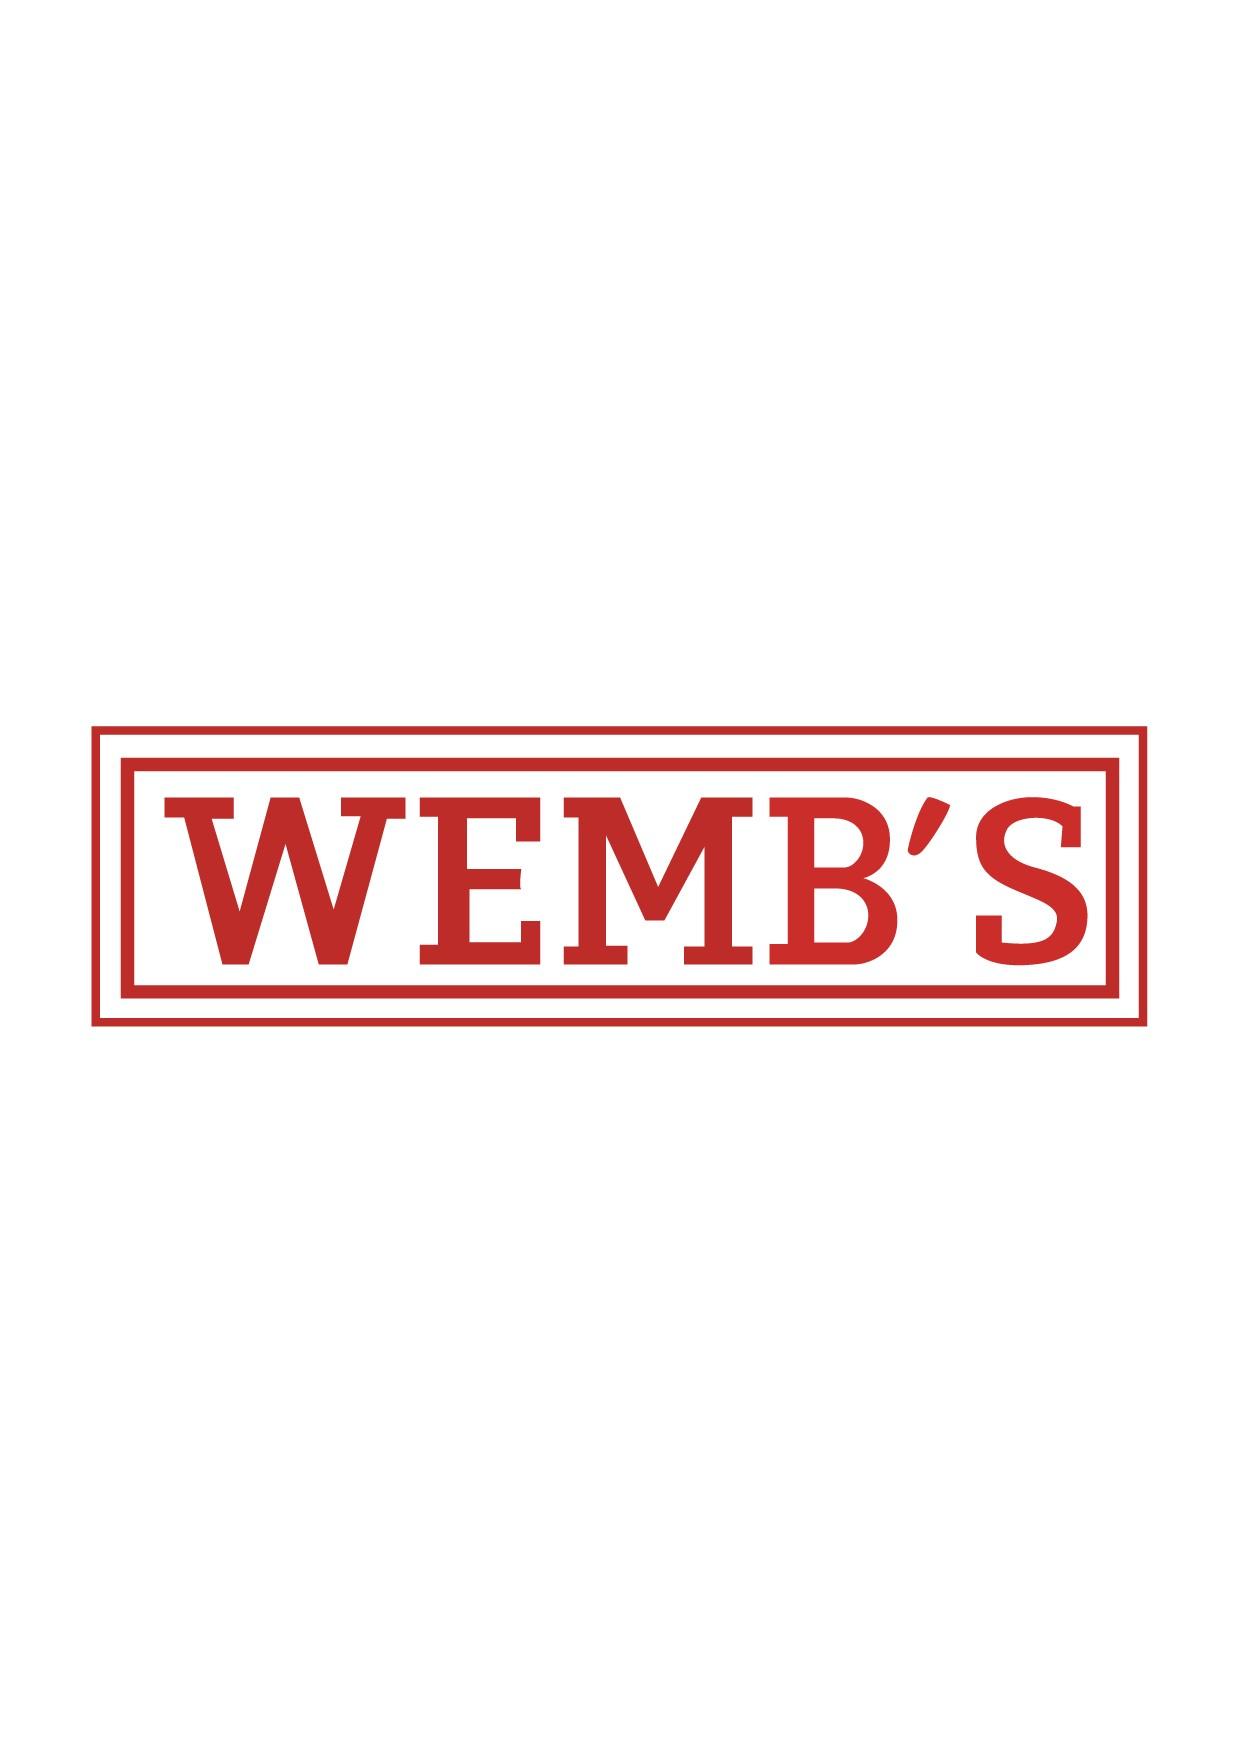 WEMBS MARKETING SDN. BHD.